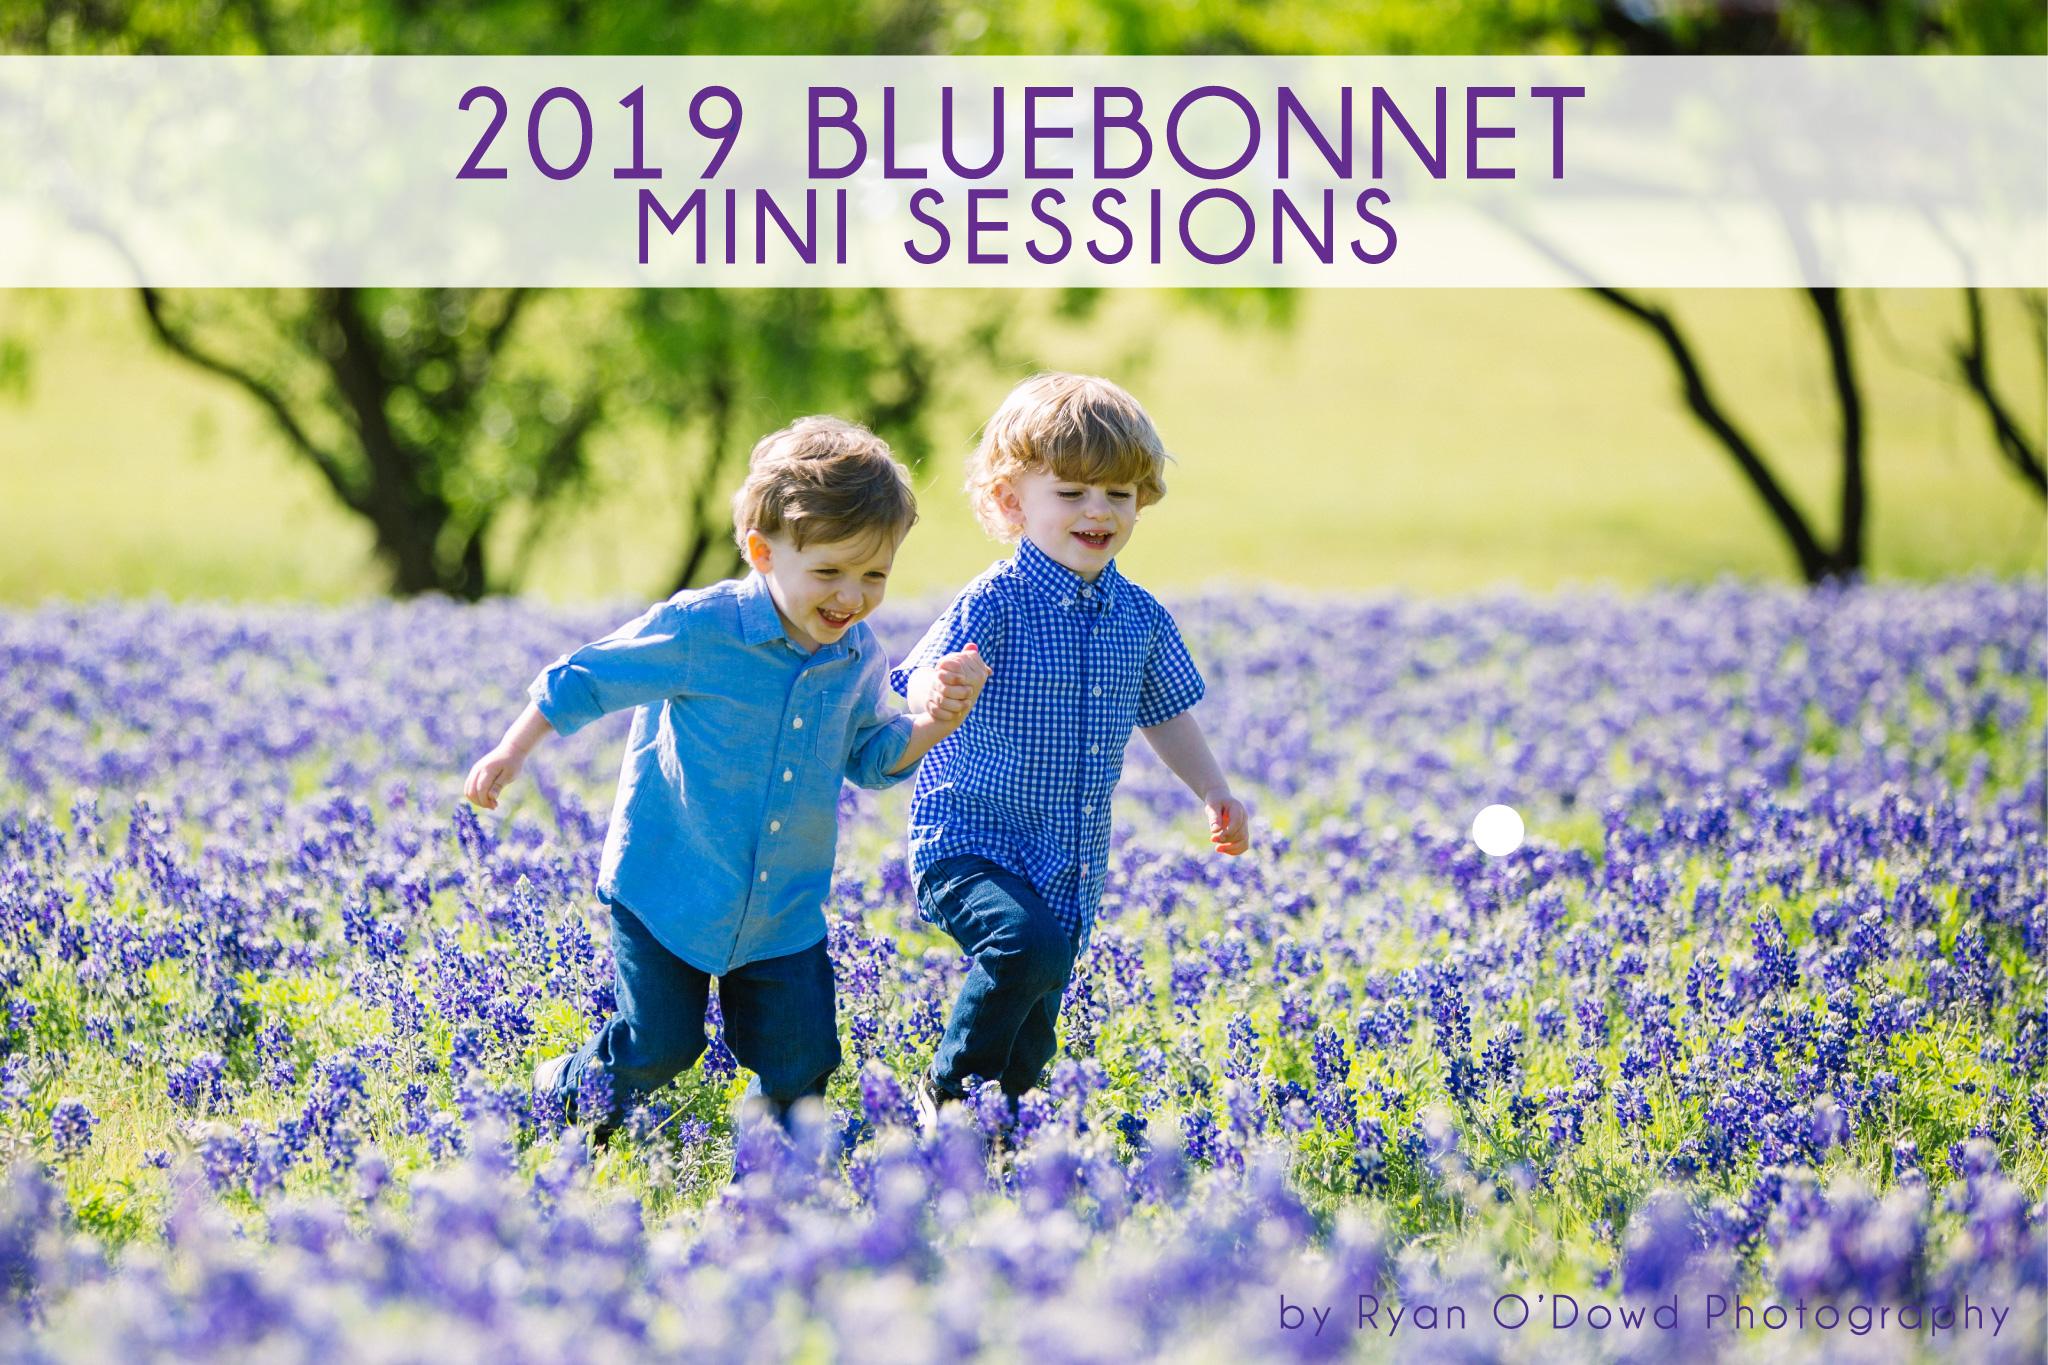 2019 bluebonnets